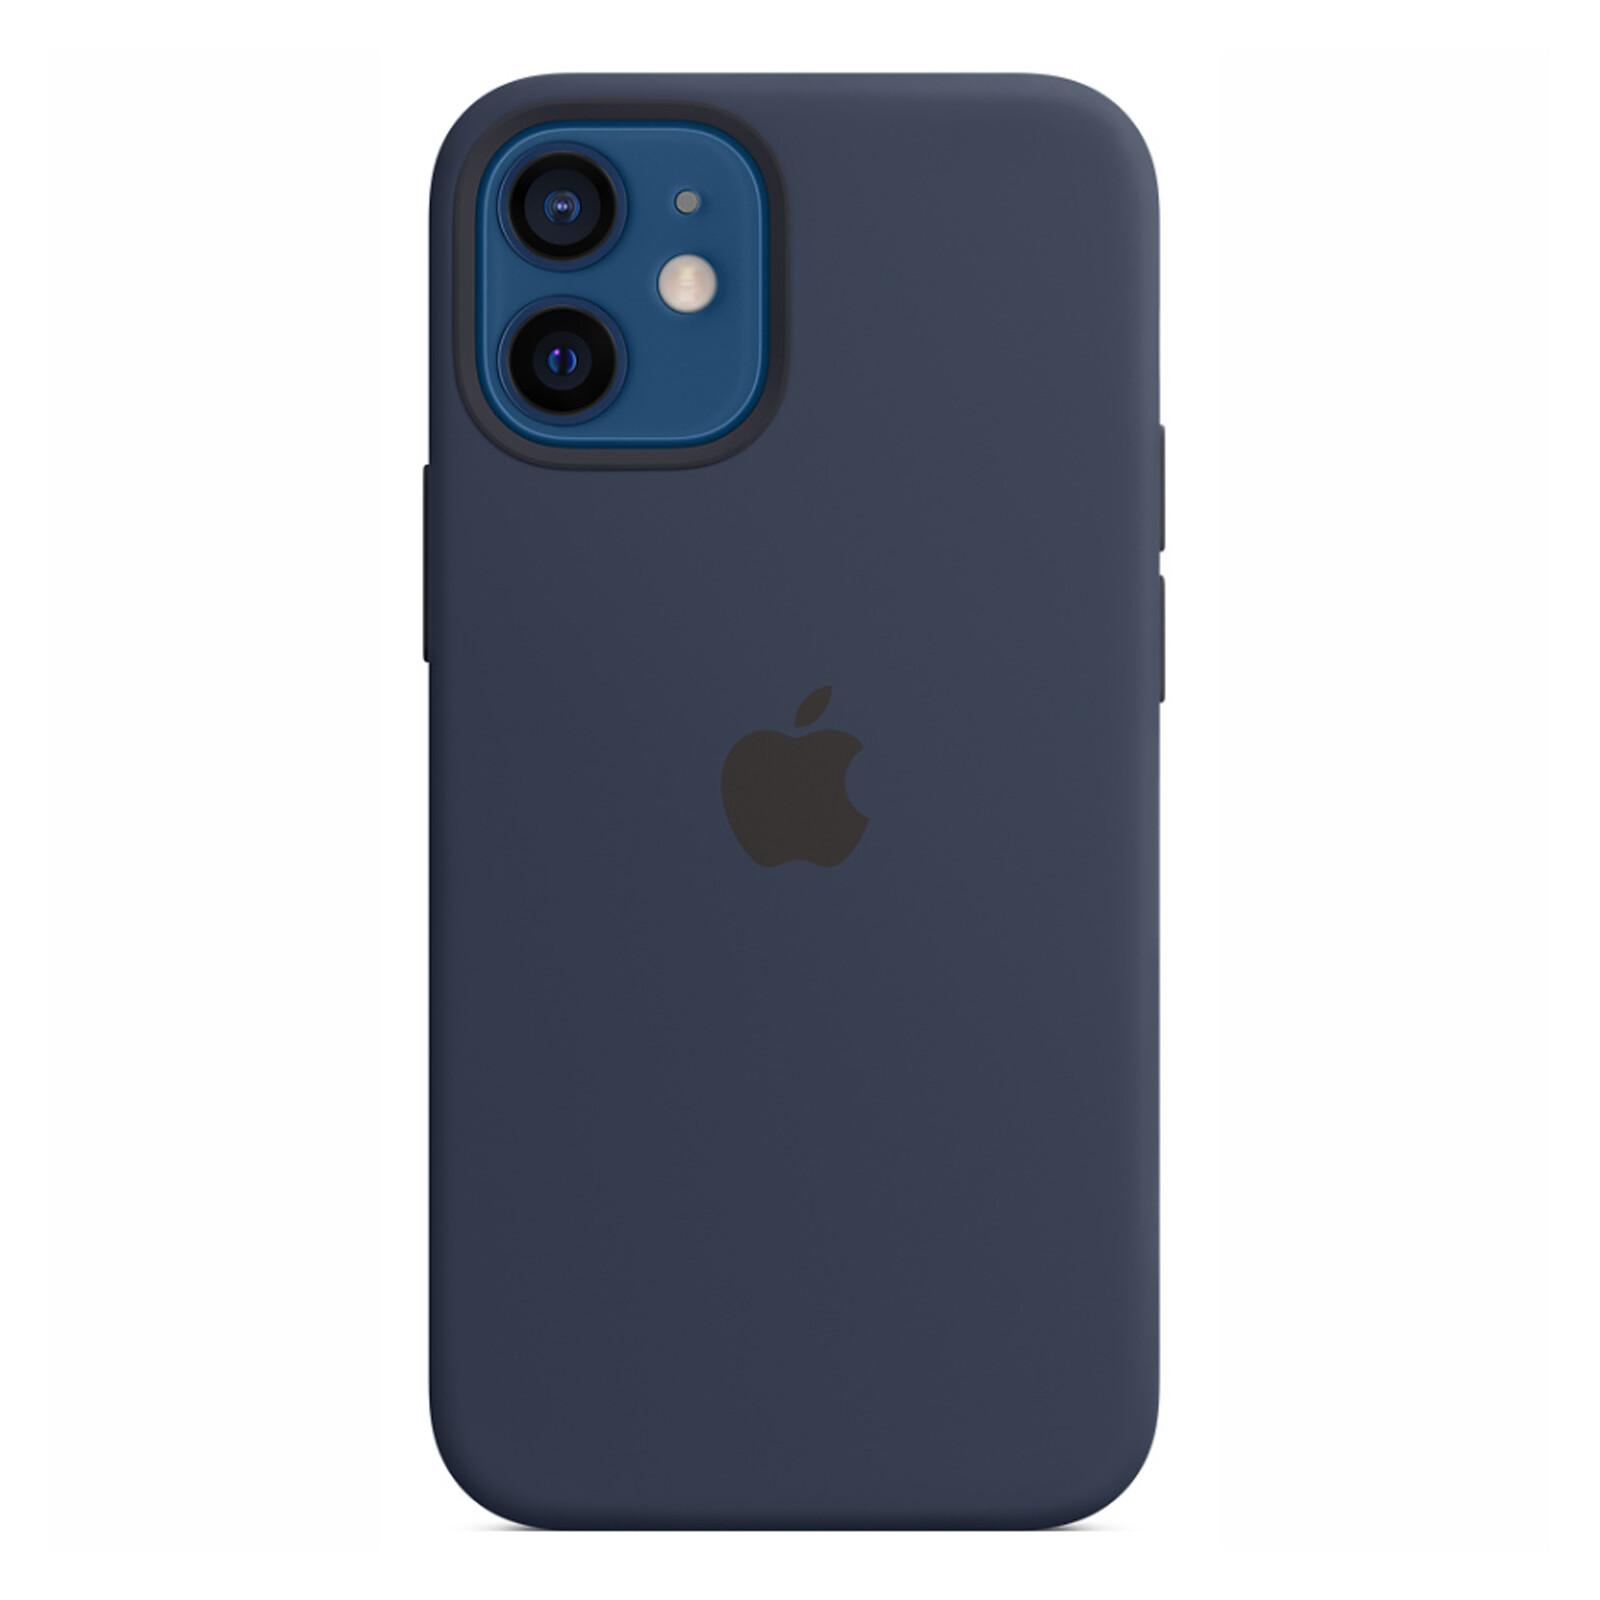 Apple iPhone 12 mini Silikon Case mit MagSafe dunkelmarine